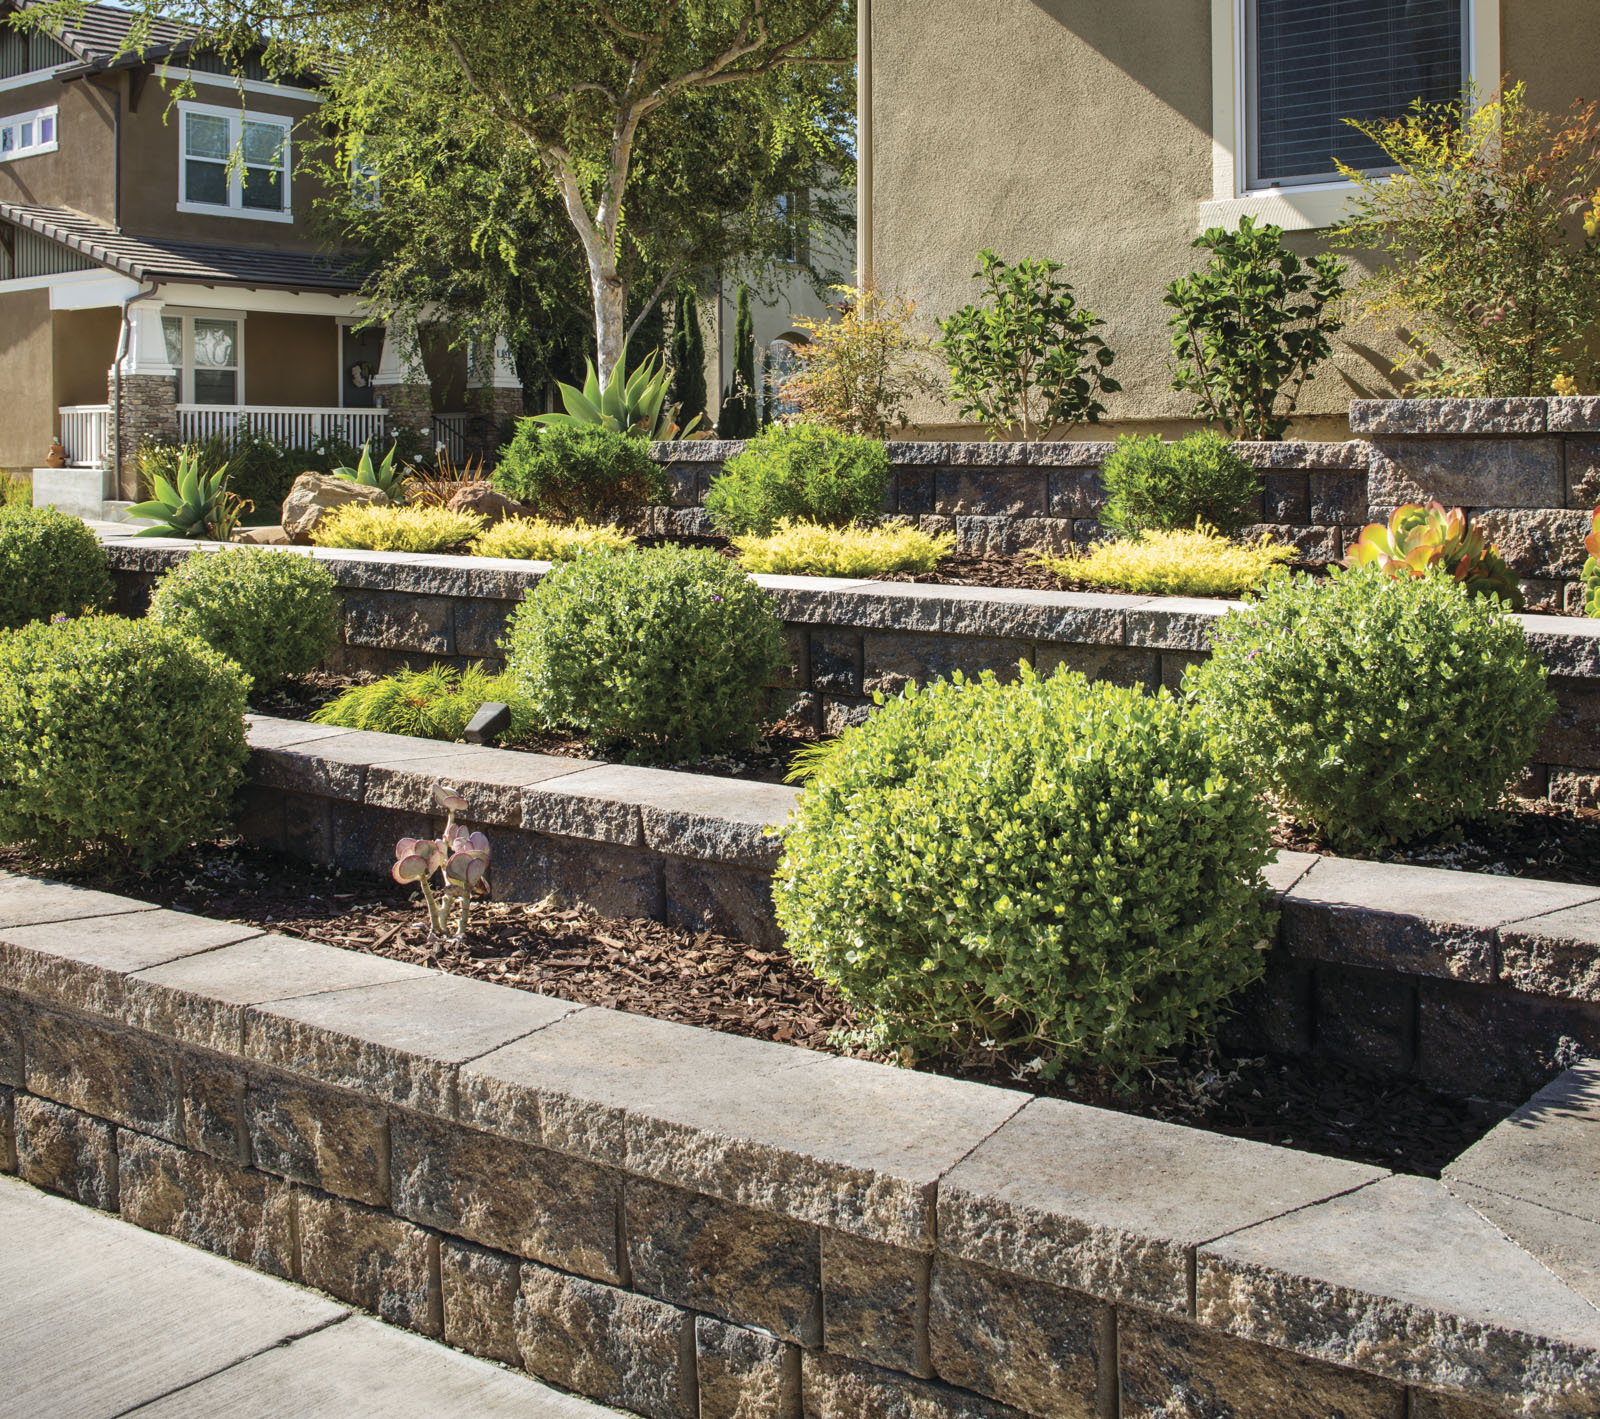 terraced paving stone walls